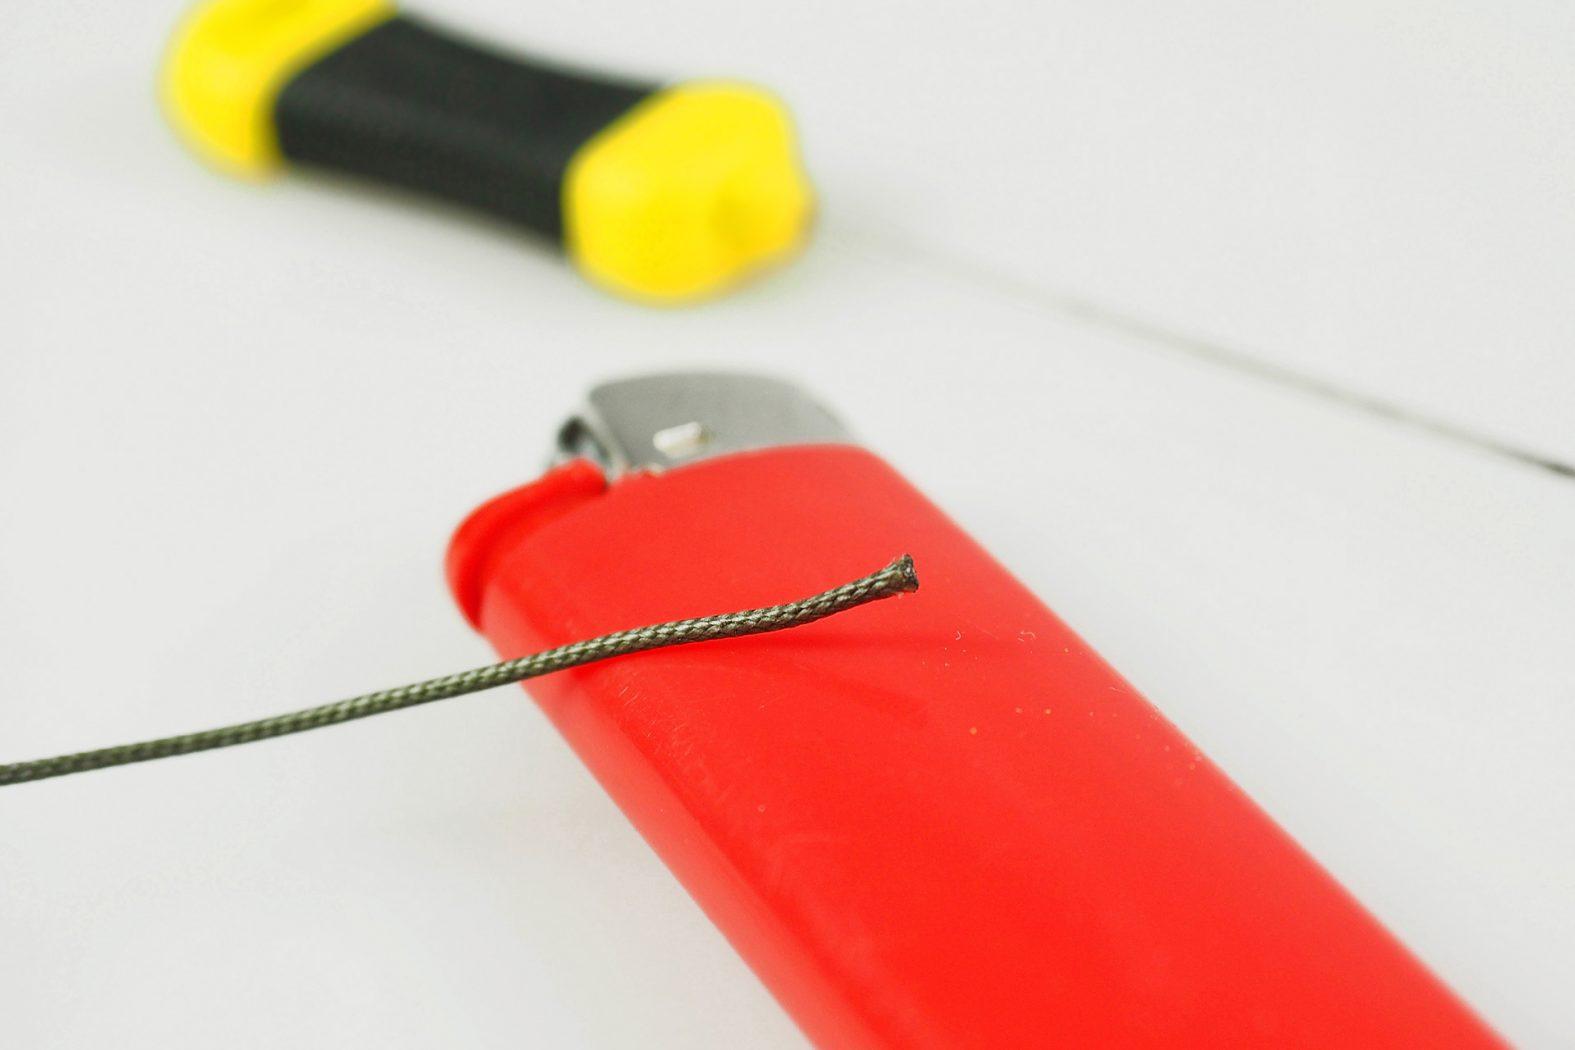 Leadcore an Hauptschnur befestigen